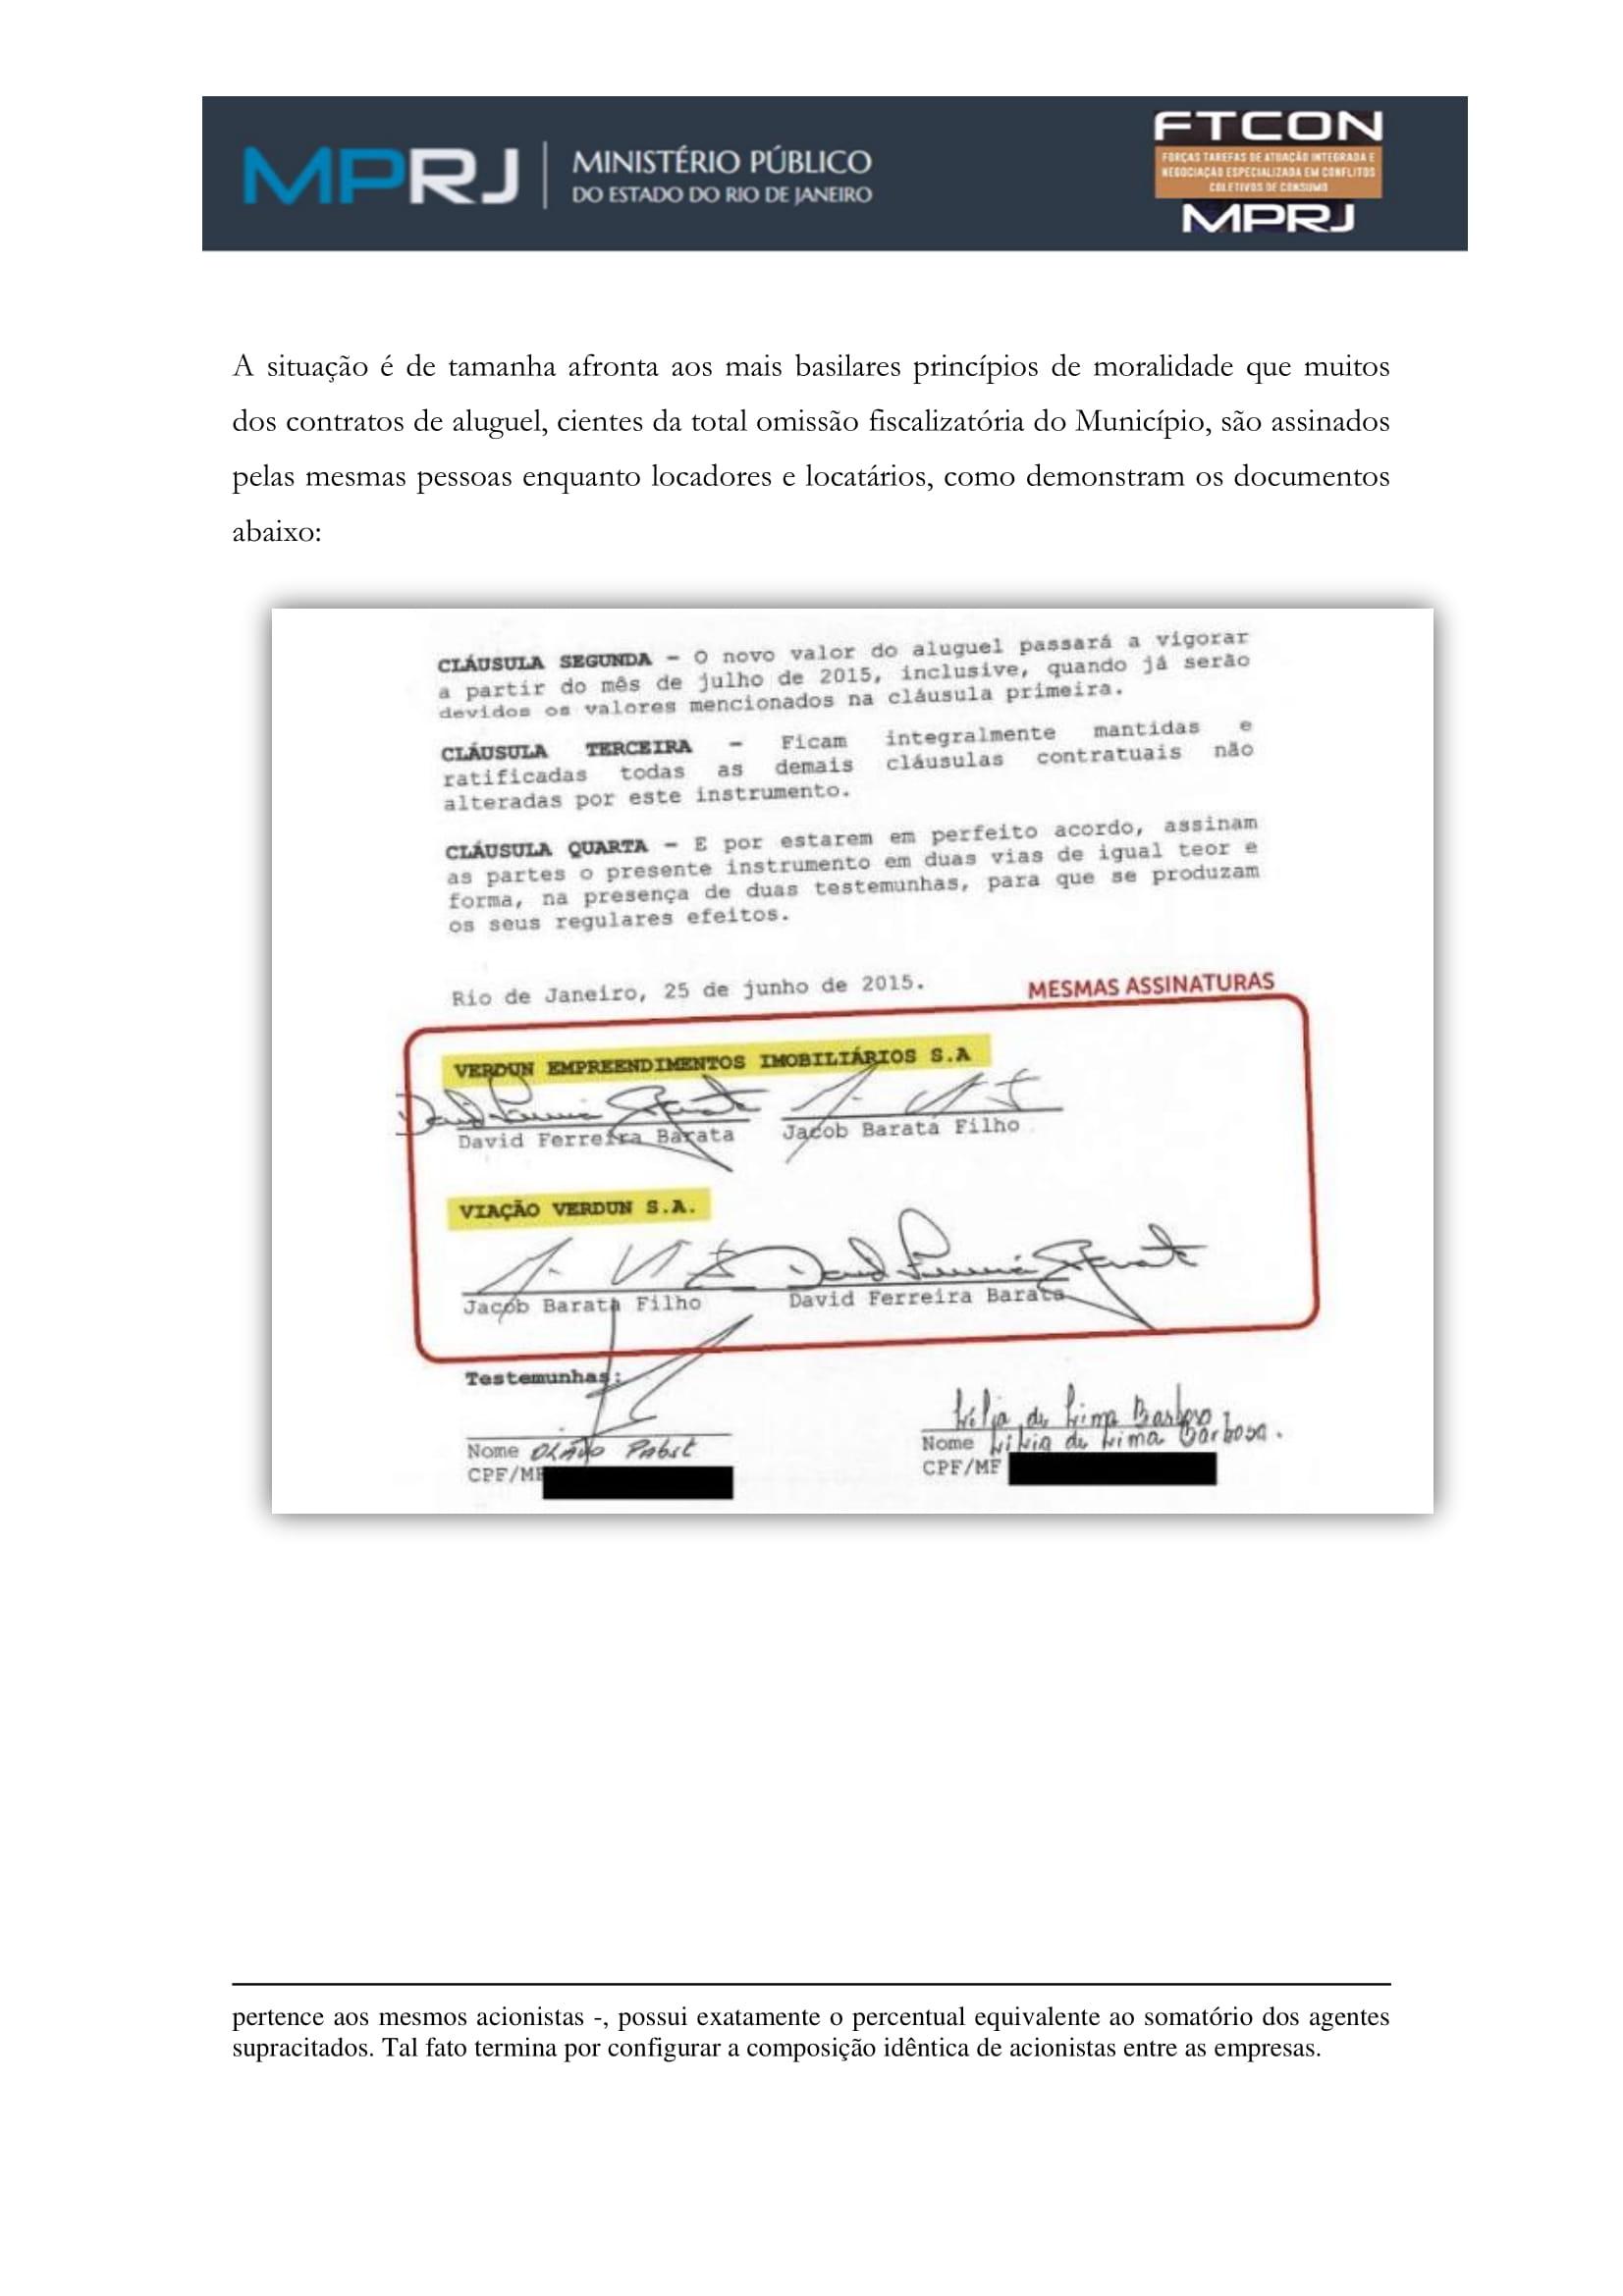 acp_caducidade_onibus_dr_rt-091